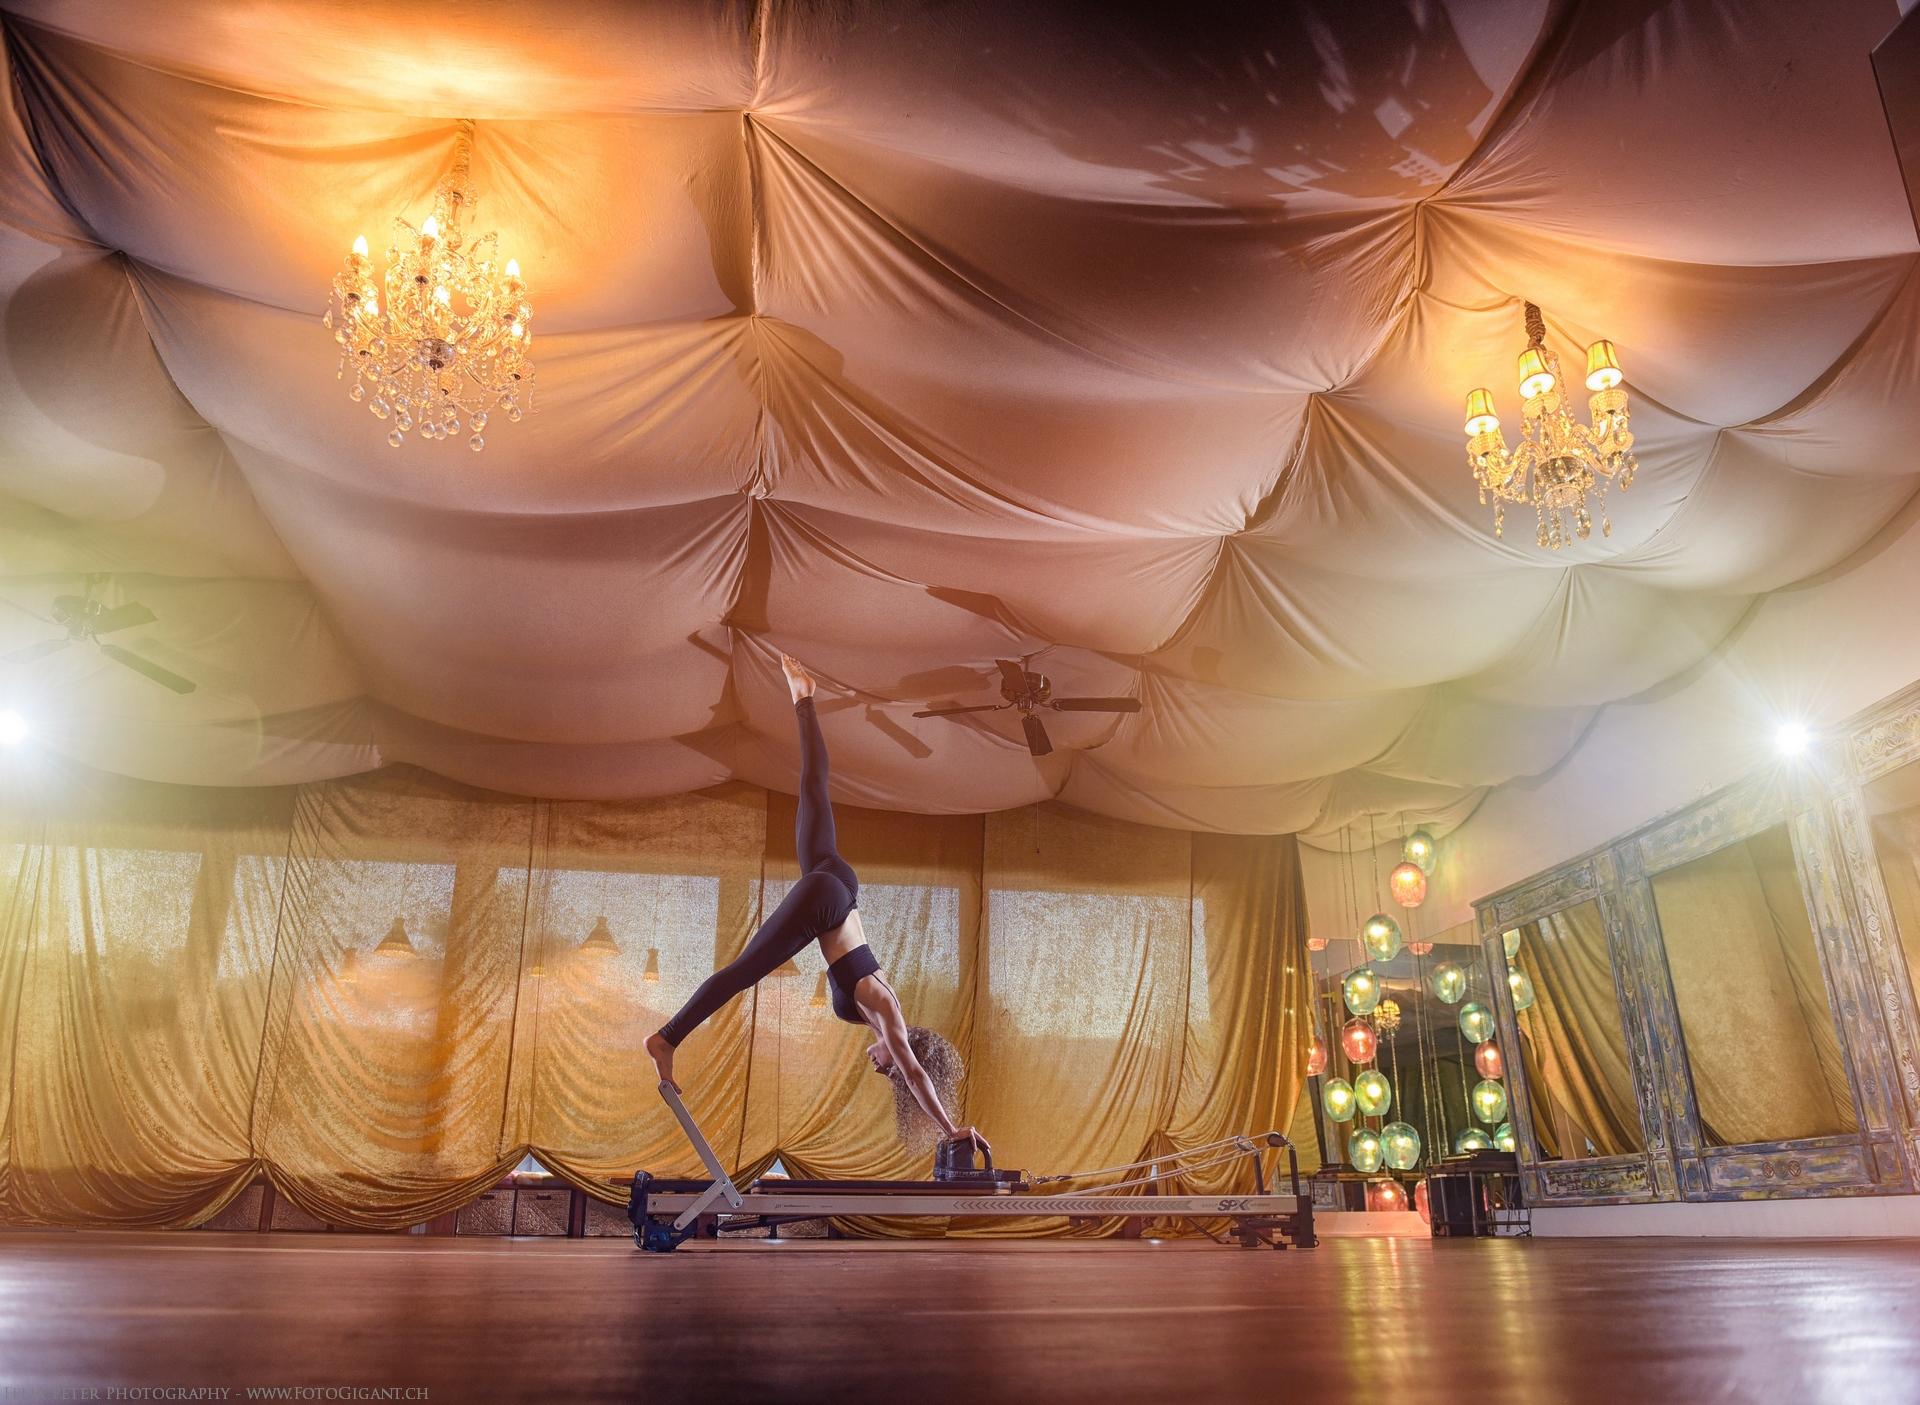 Felix-Peter-Yoga-Pilates-Dance-Fotografie_Bern_117.jpg